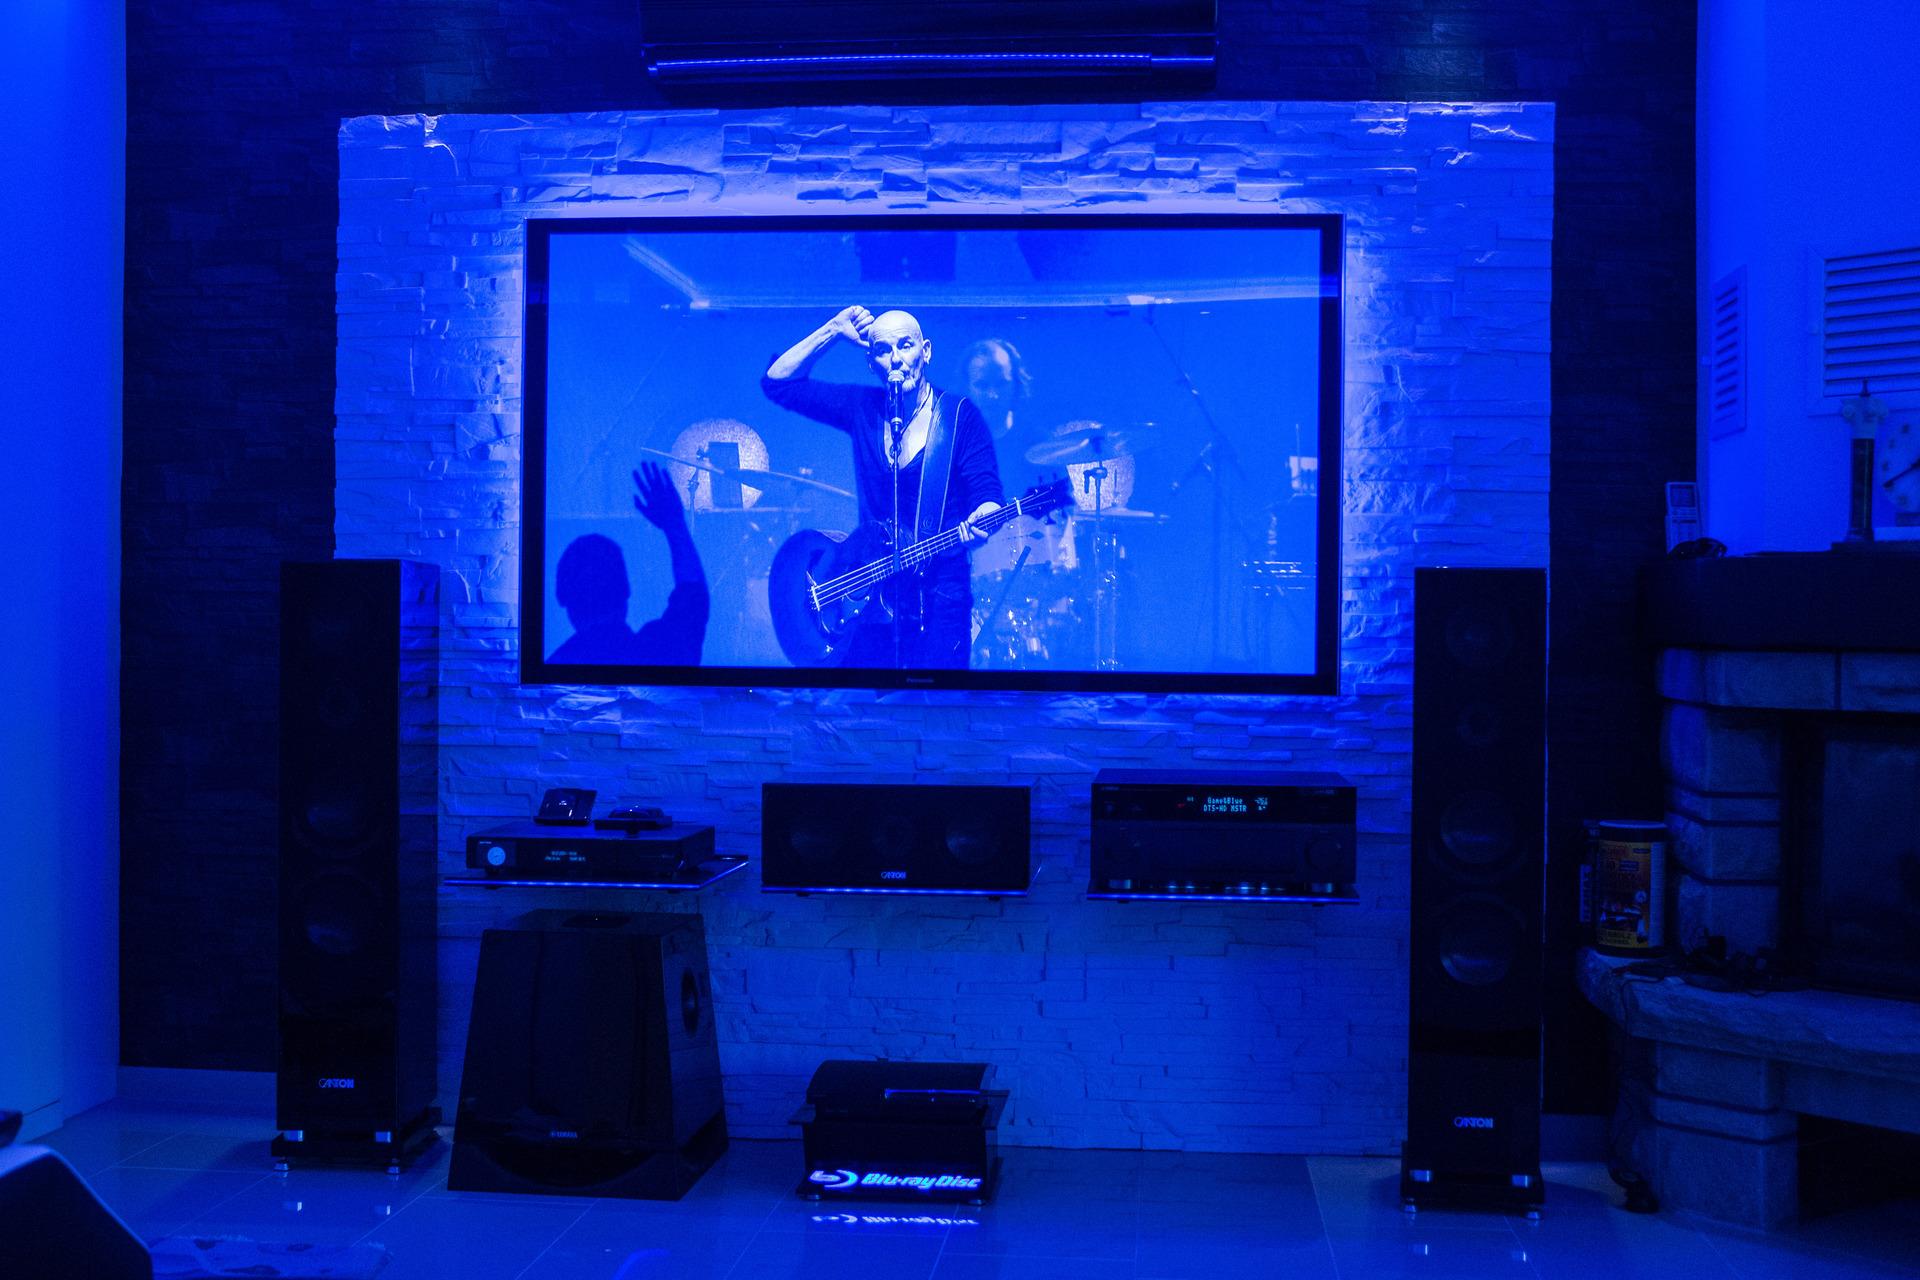 komplettansicht mit neuem panasonic 65 zoll vtw60 plasma. Black Bedroom Furniture Sets. Home Design Ideas